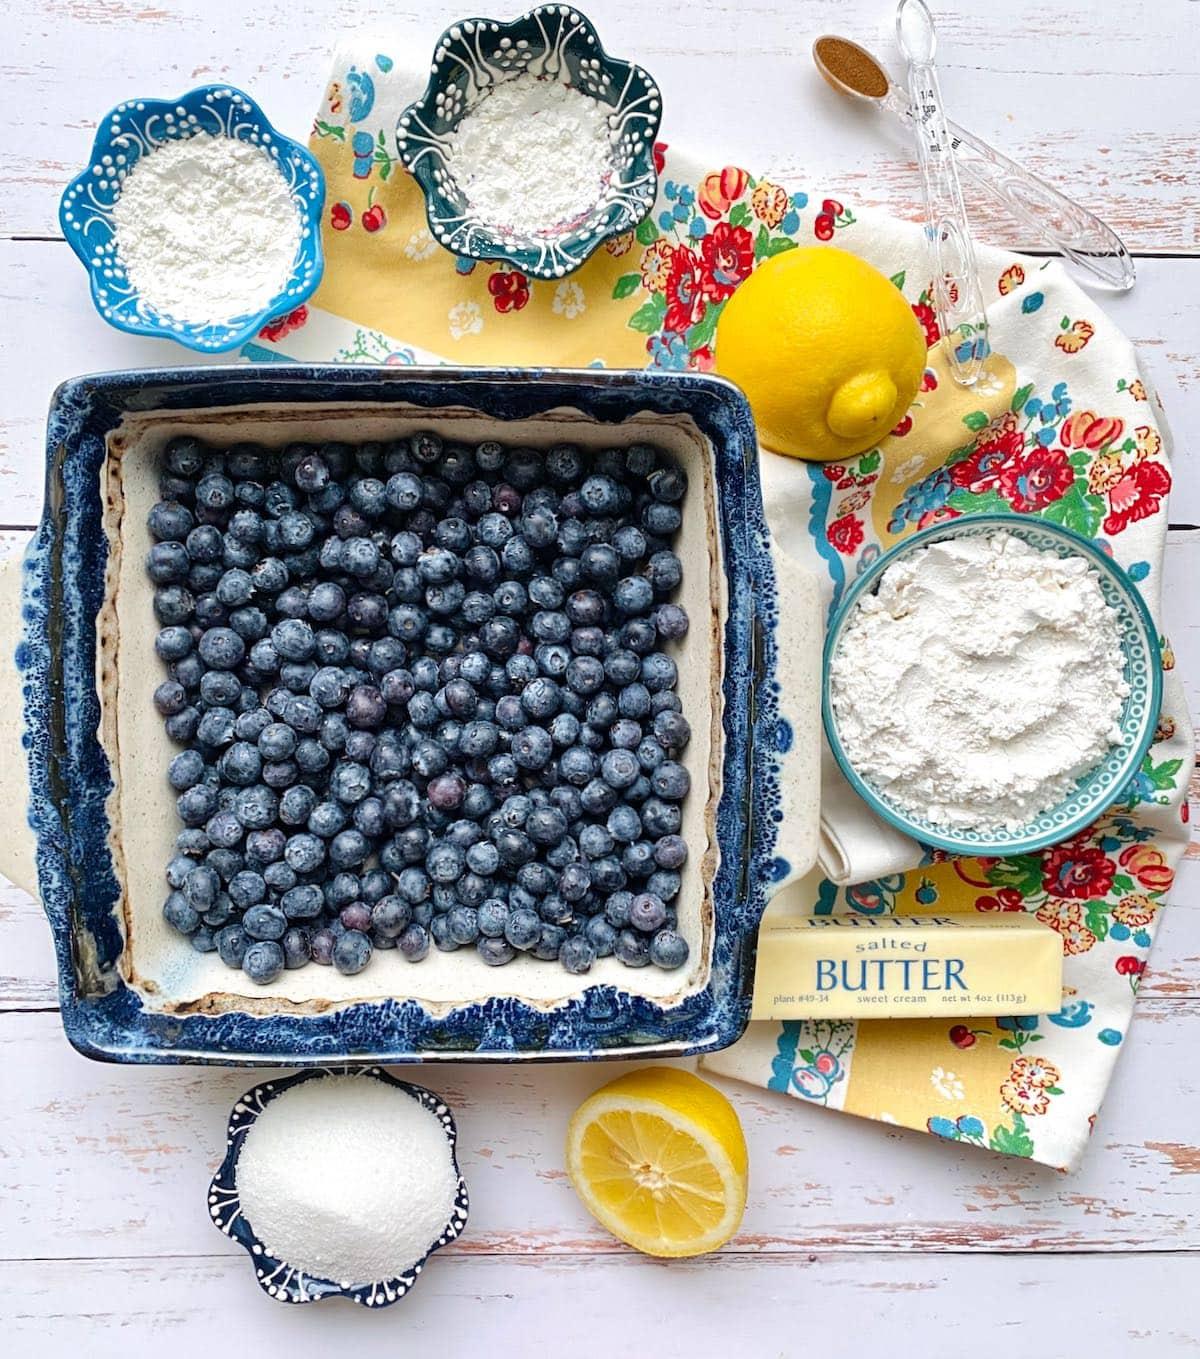 ingredients needed to make blueberry lemon crumble dessert.